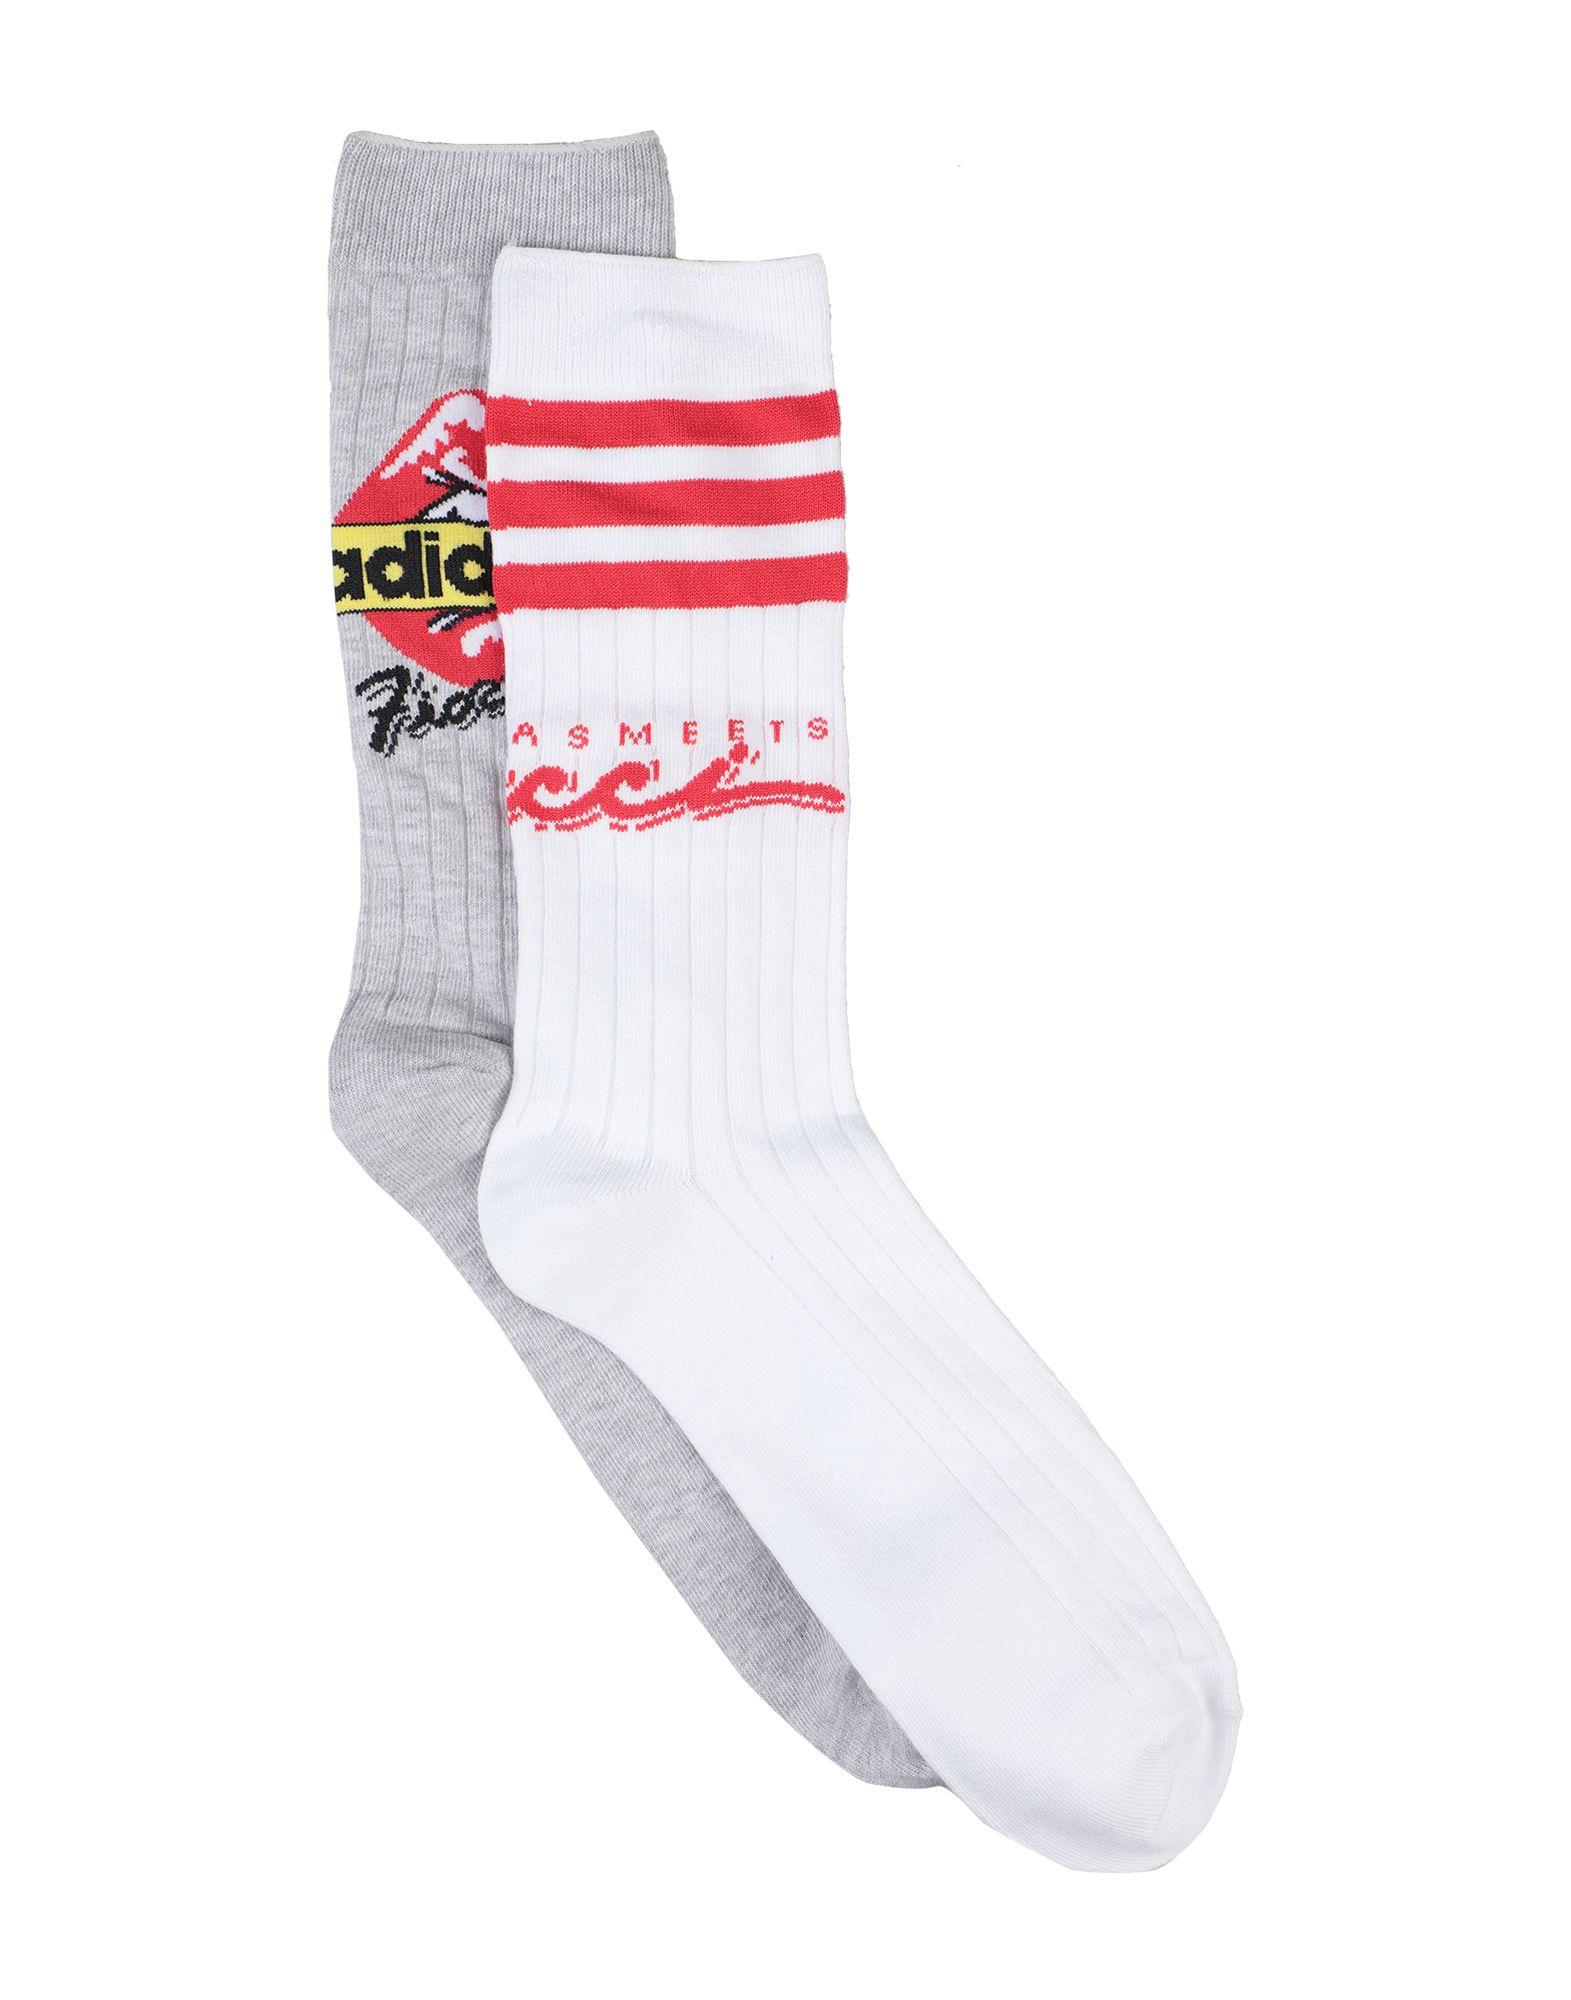 ADIDAS ORIGINALS x FIORUCCI Короткие носки